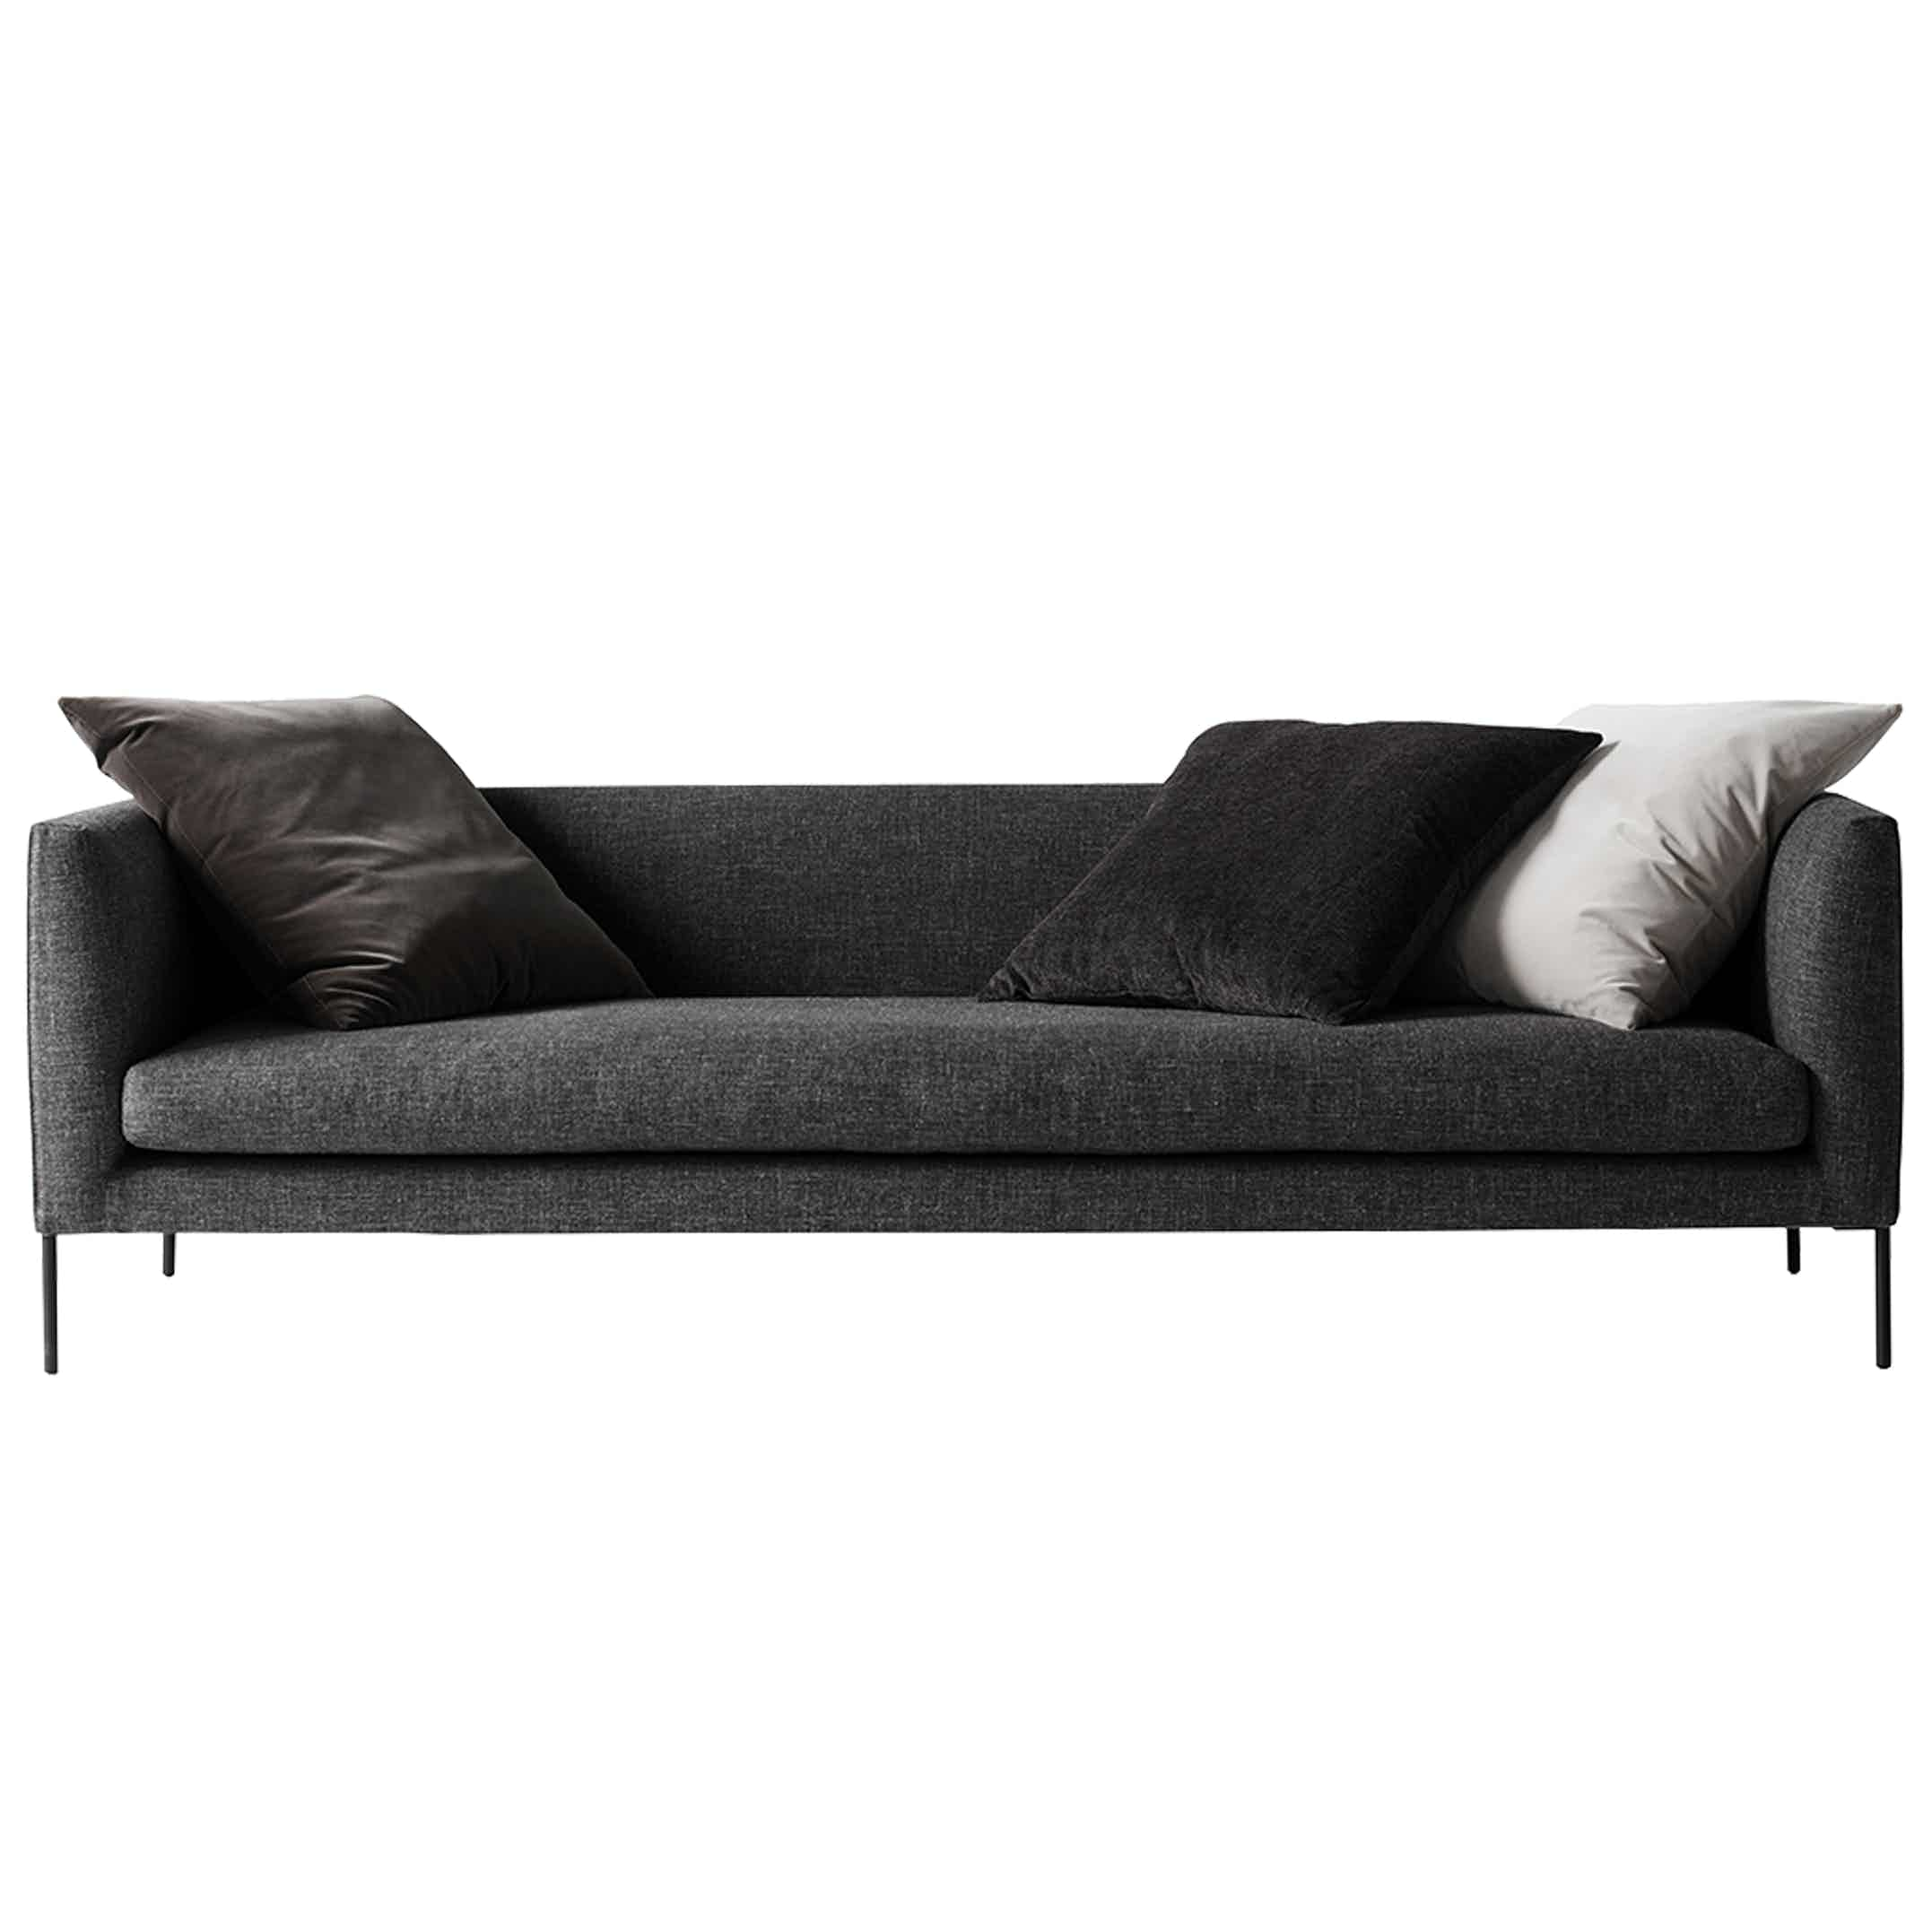 Wendelbo-grey-blade-sofa-thumbnail-haute-living